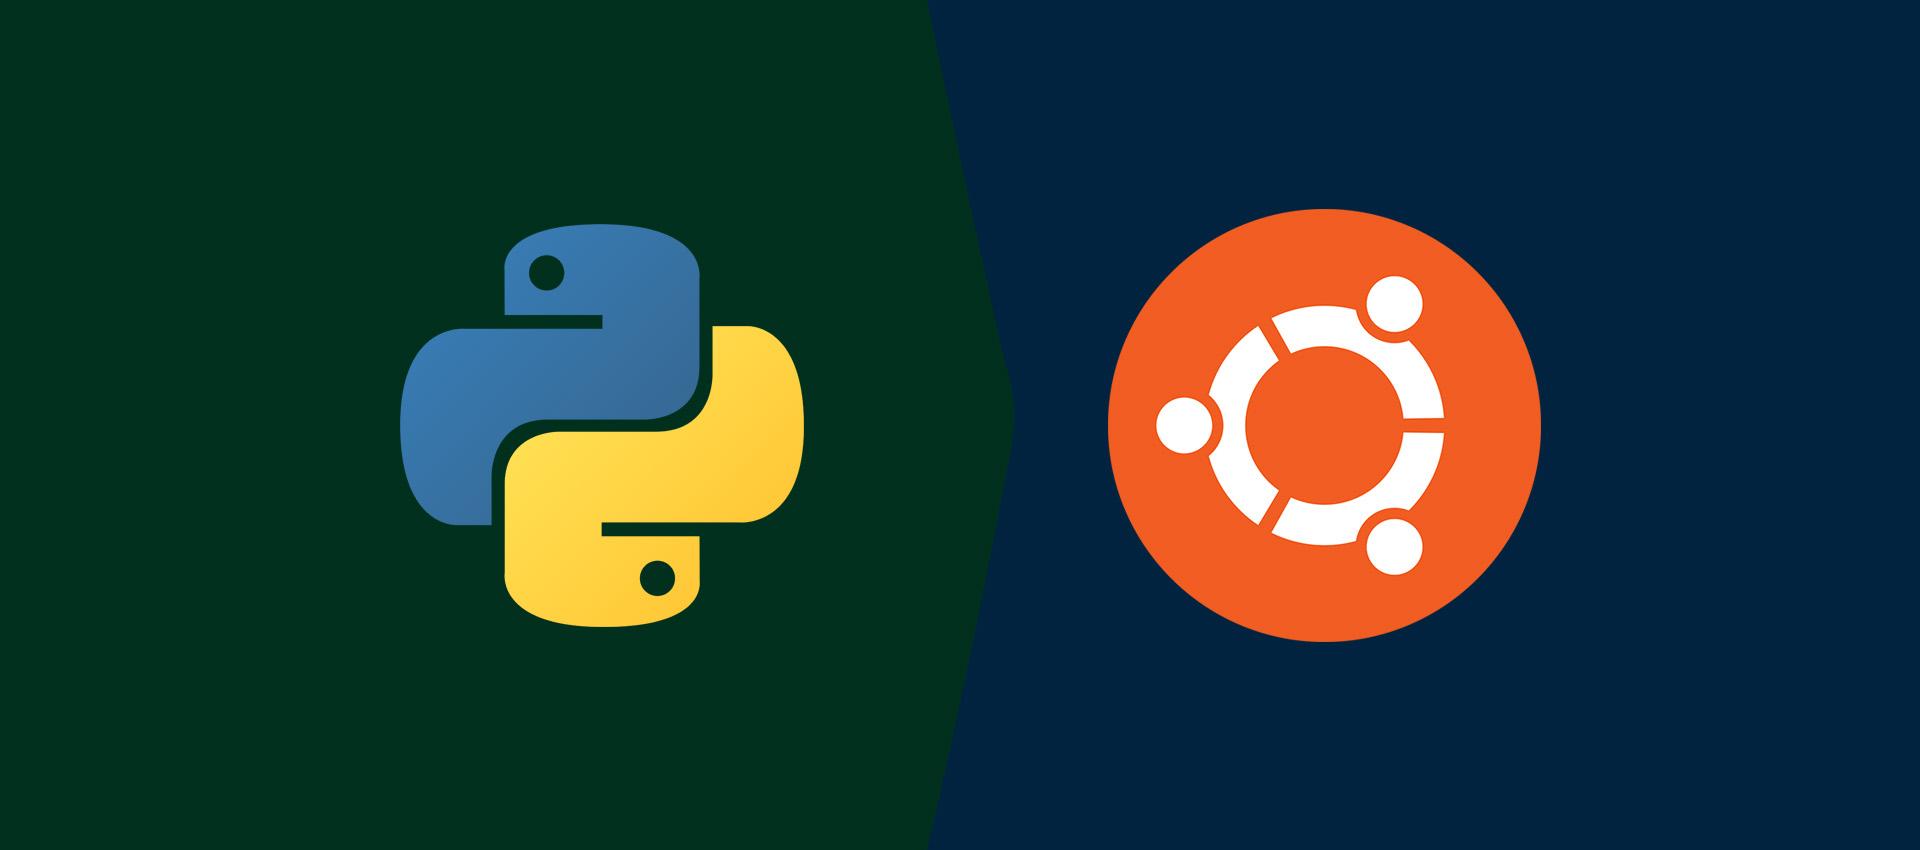 How To Install Python 3.7 On Ubuntu 18.04 LTS